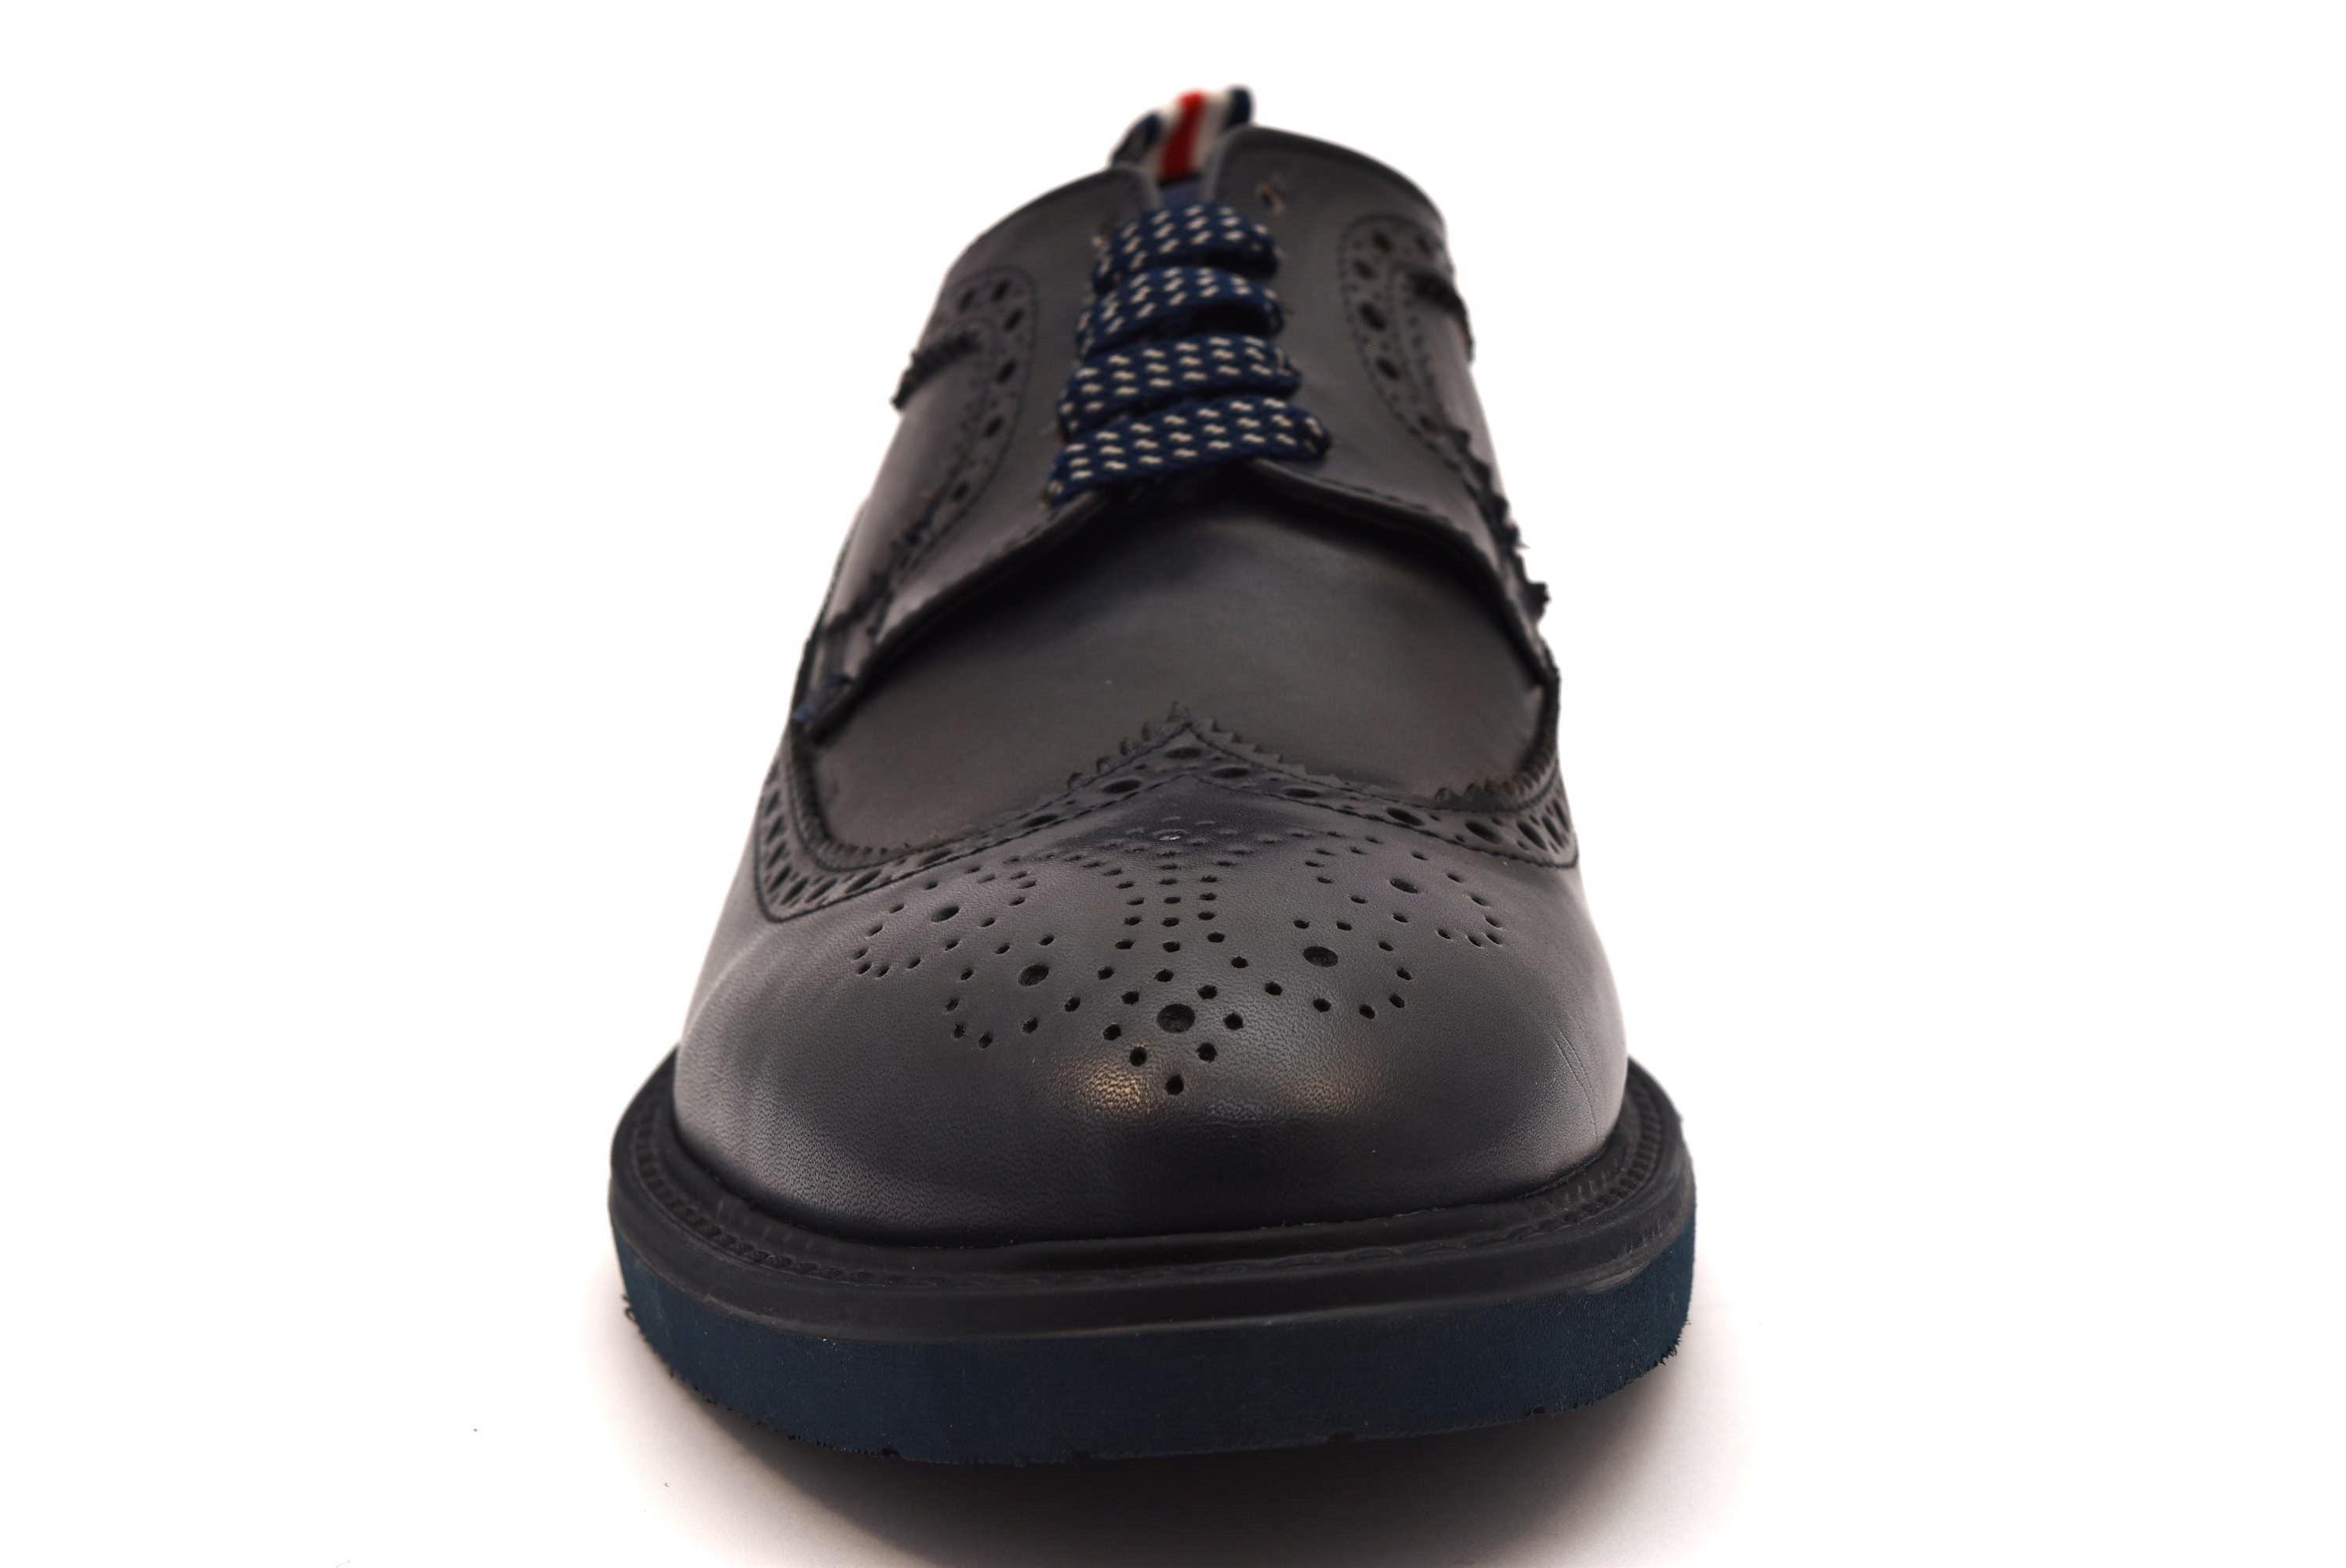 sospetto svegliati offerta  CAFè NOIR JRP134 228 RP134 BLU Scarpe Uomo | shoesmyfriends.it